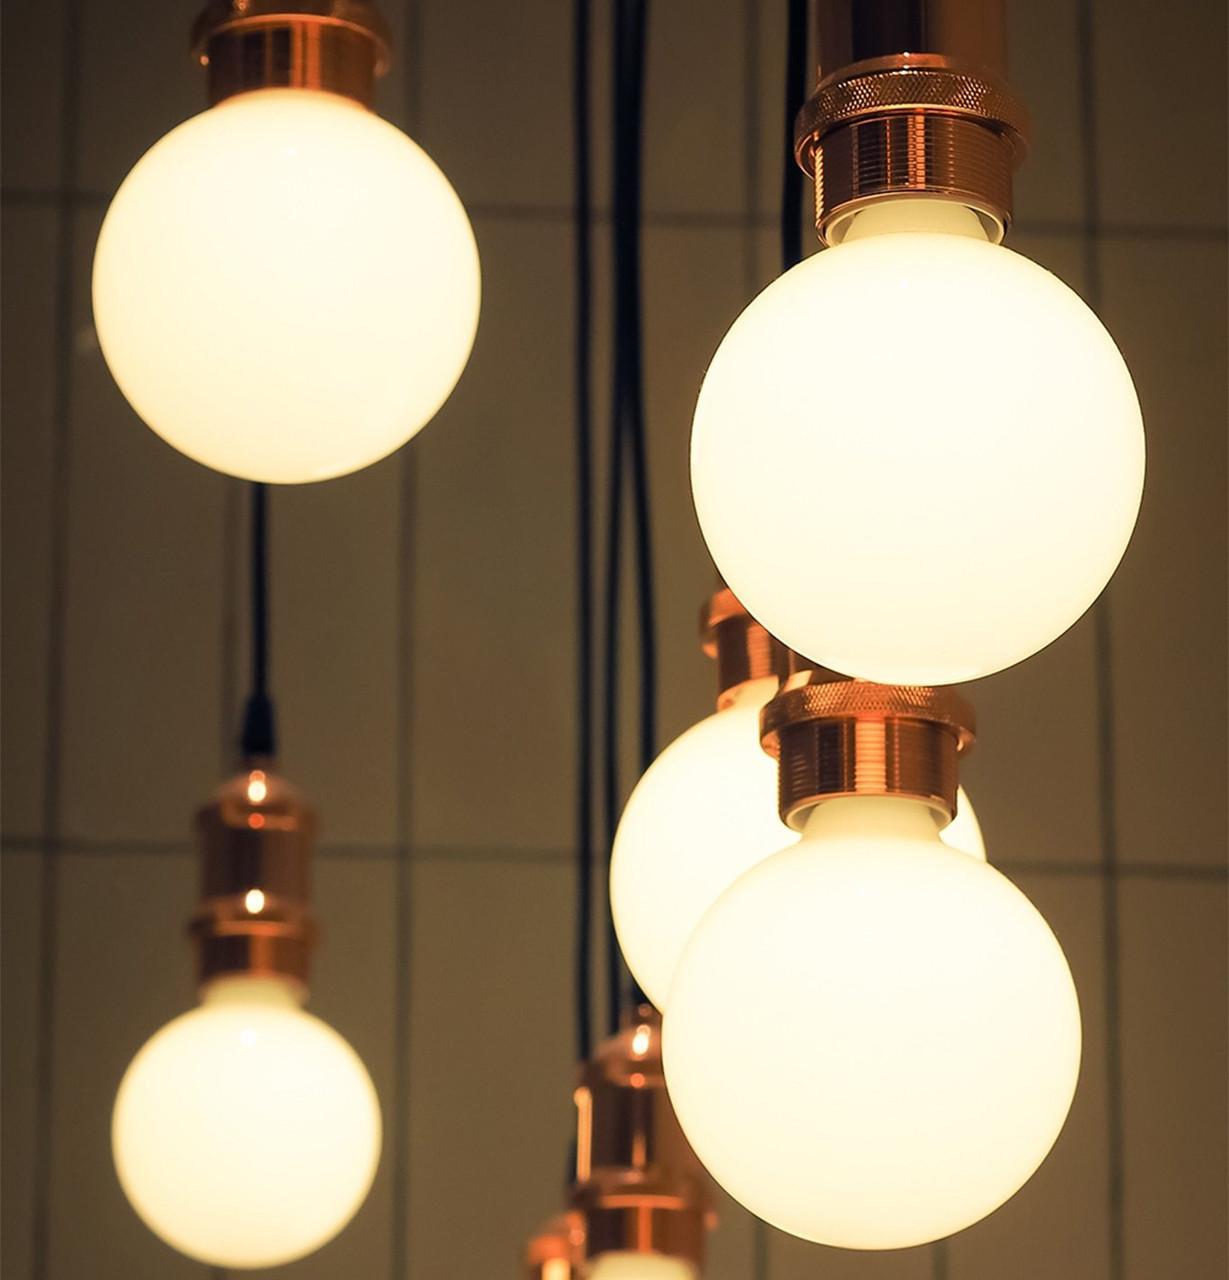 Crompton Lamps LED Globe 7.5W Light Bulbs